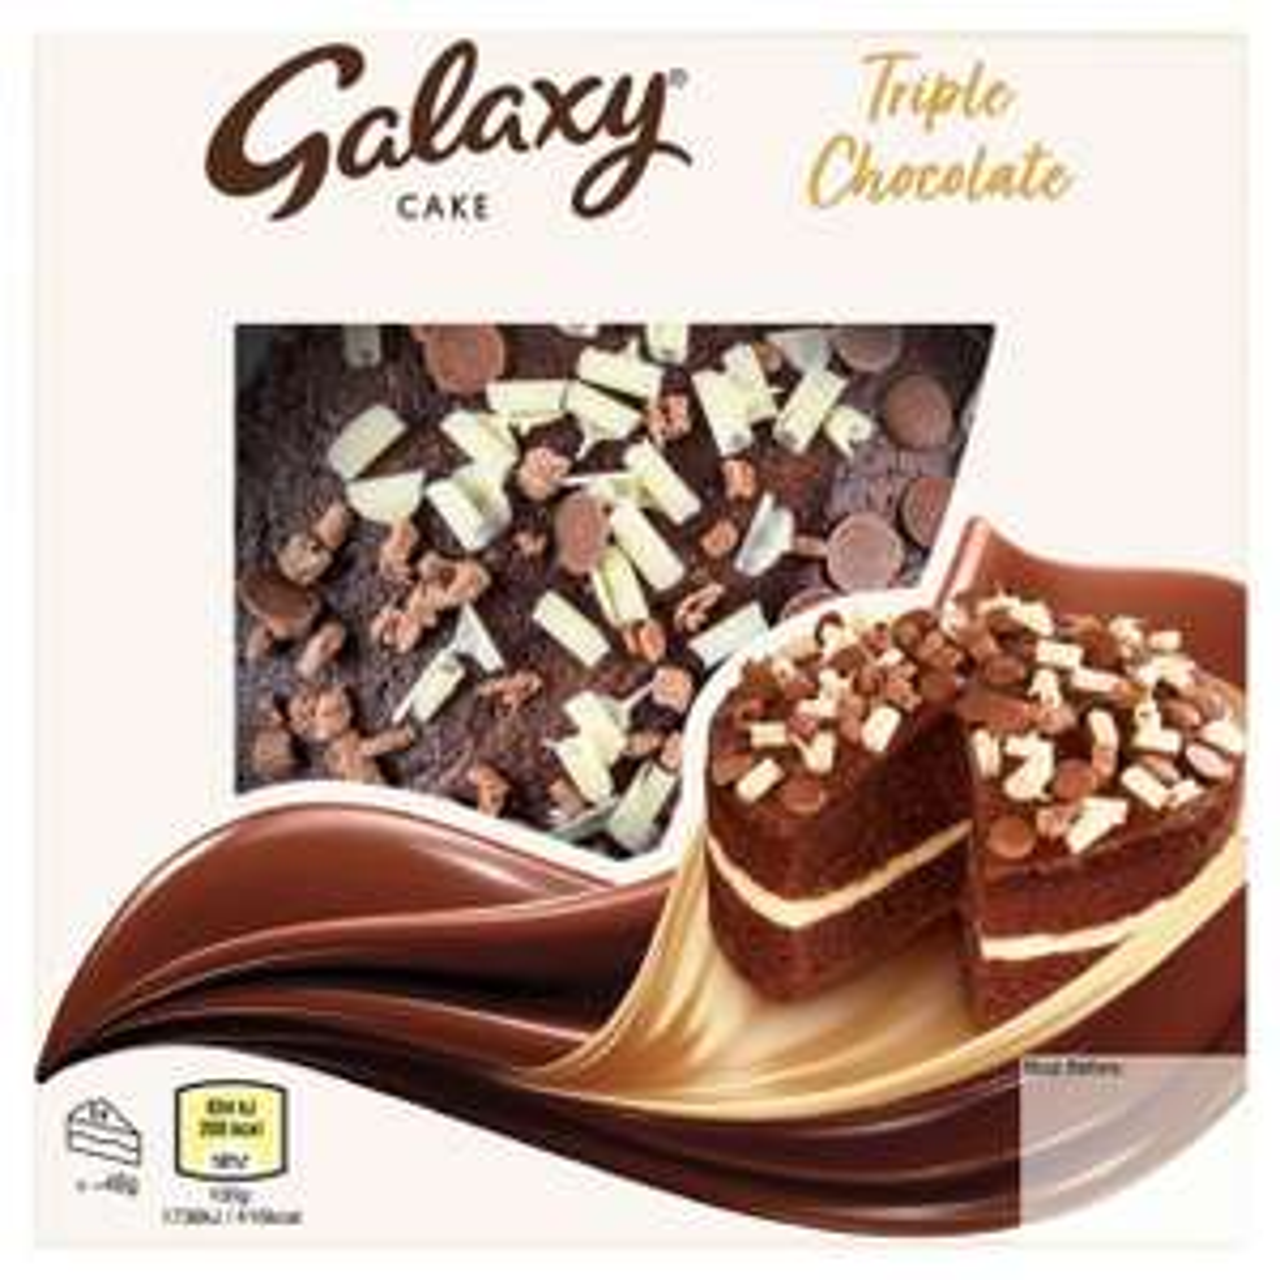 Galaxy Triple Chocolate Cake £2 @ Morrisons